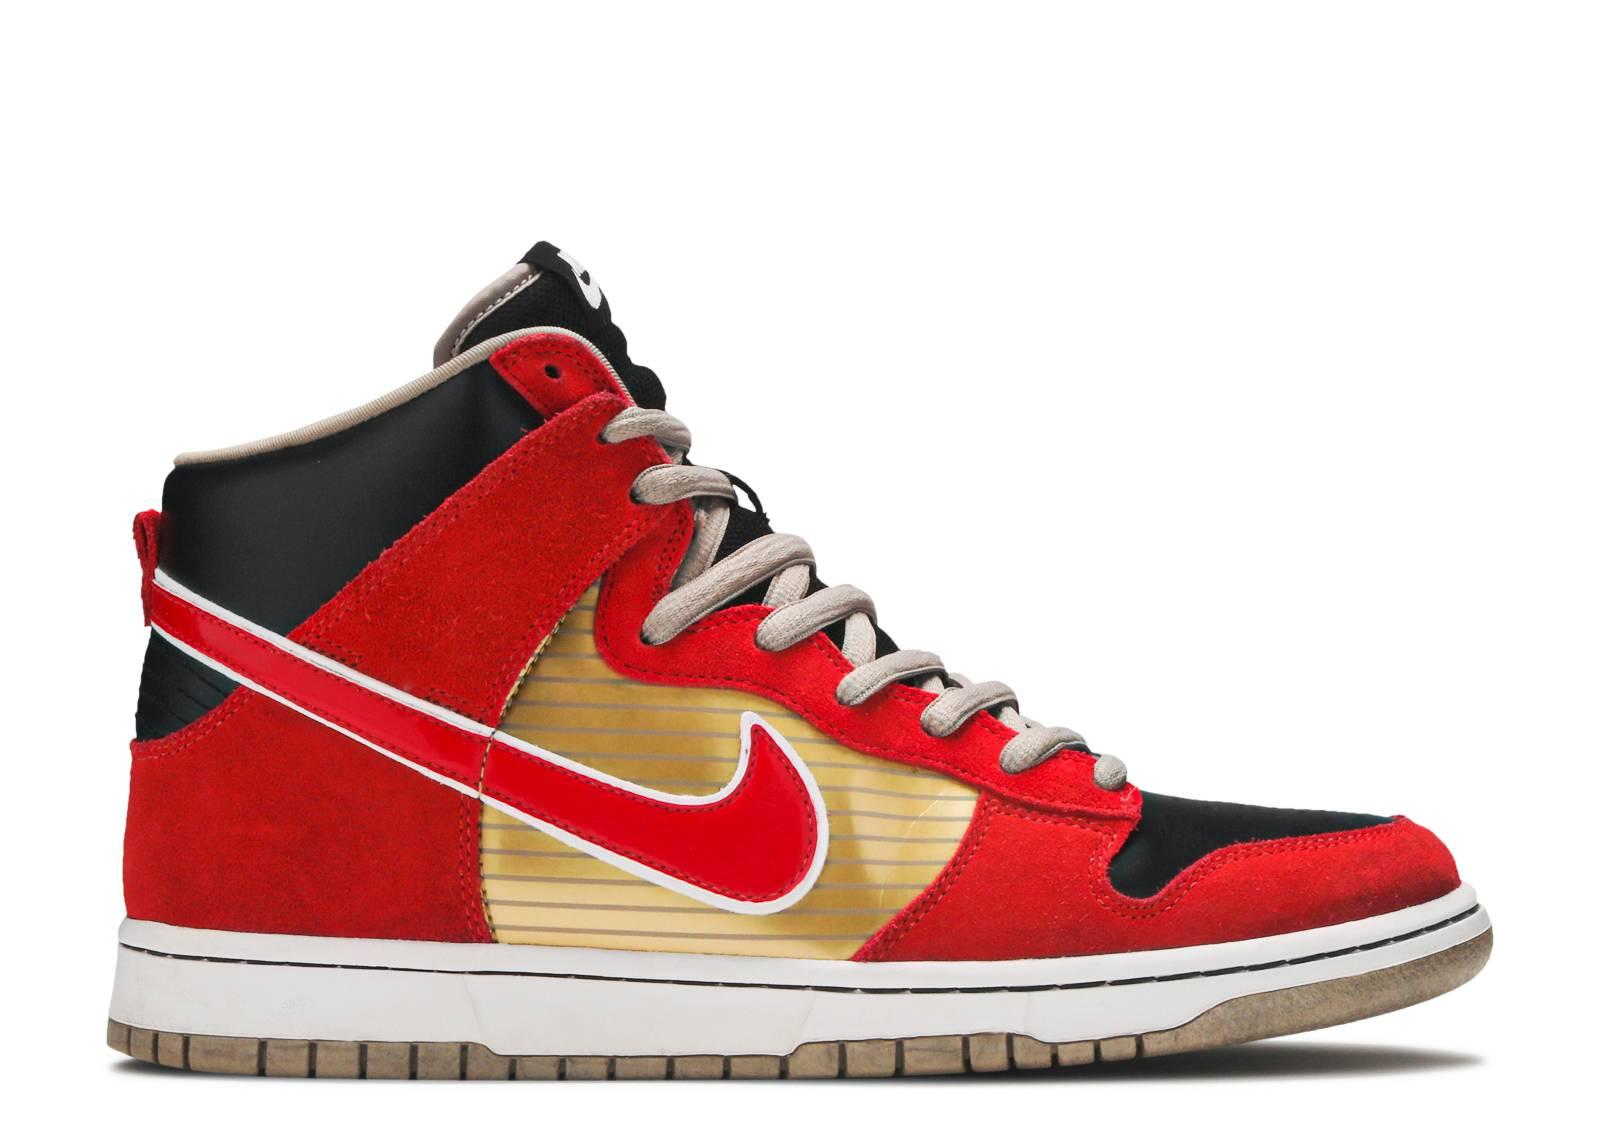 best cheap 6e742 1d7f1 Nike SB Dunk High nike. dunk high pro sb Nike SB Tecate ...